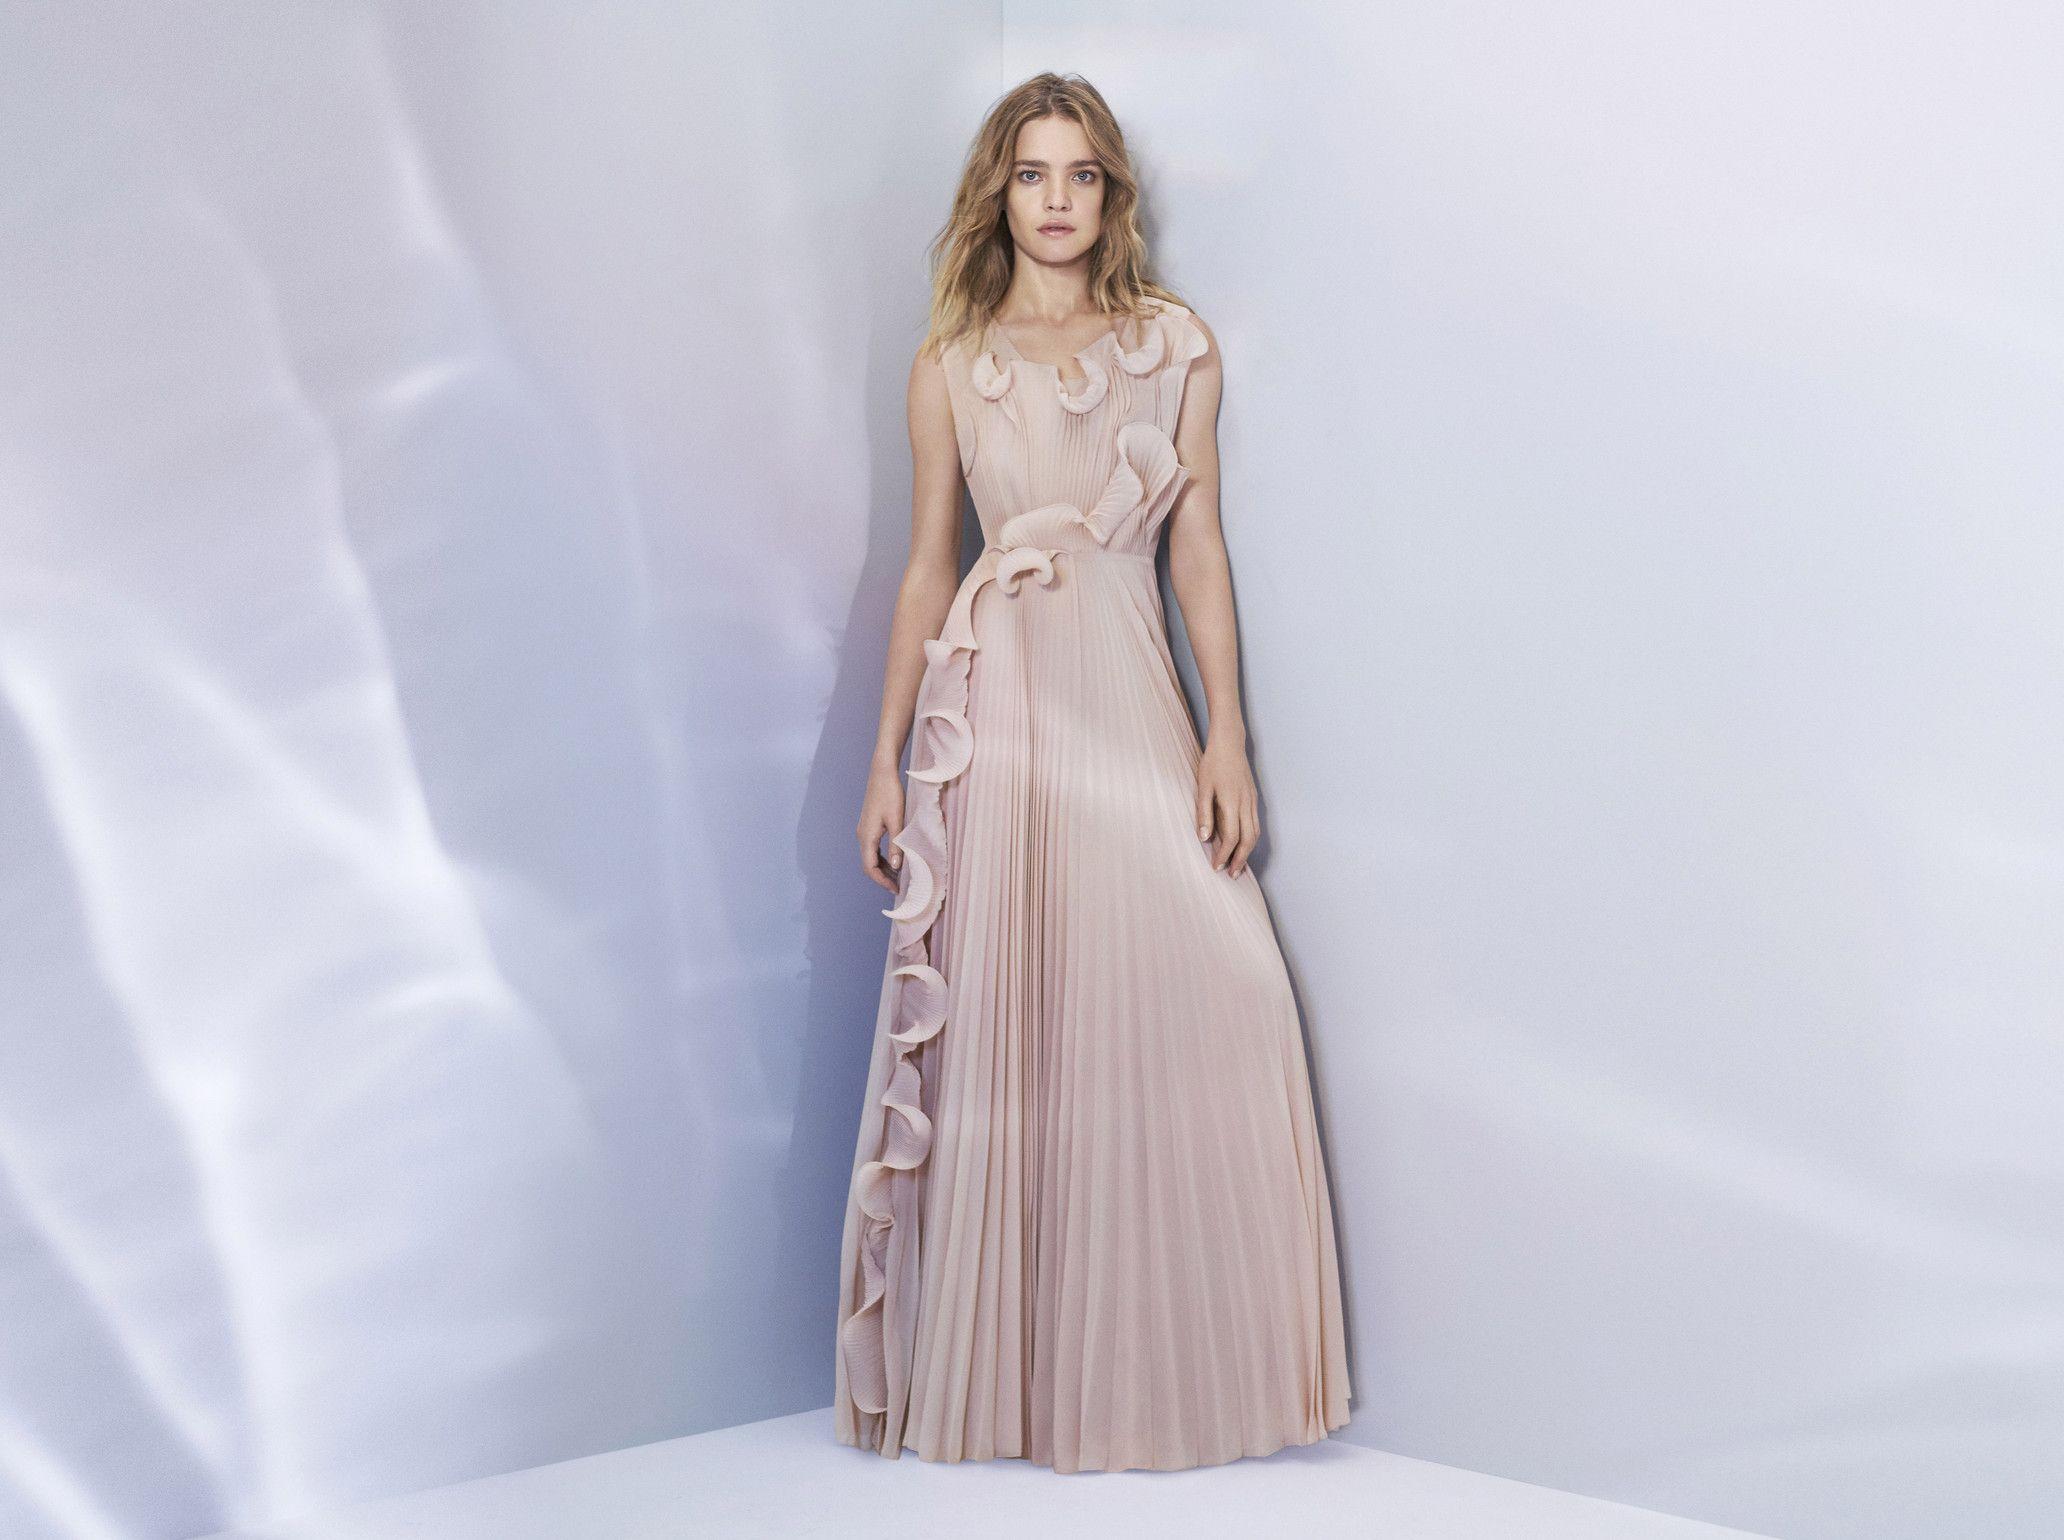 H&M Conscious Exclusive-Kollektion | Kleider h&m, Kleid ...